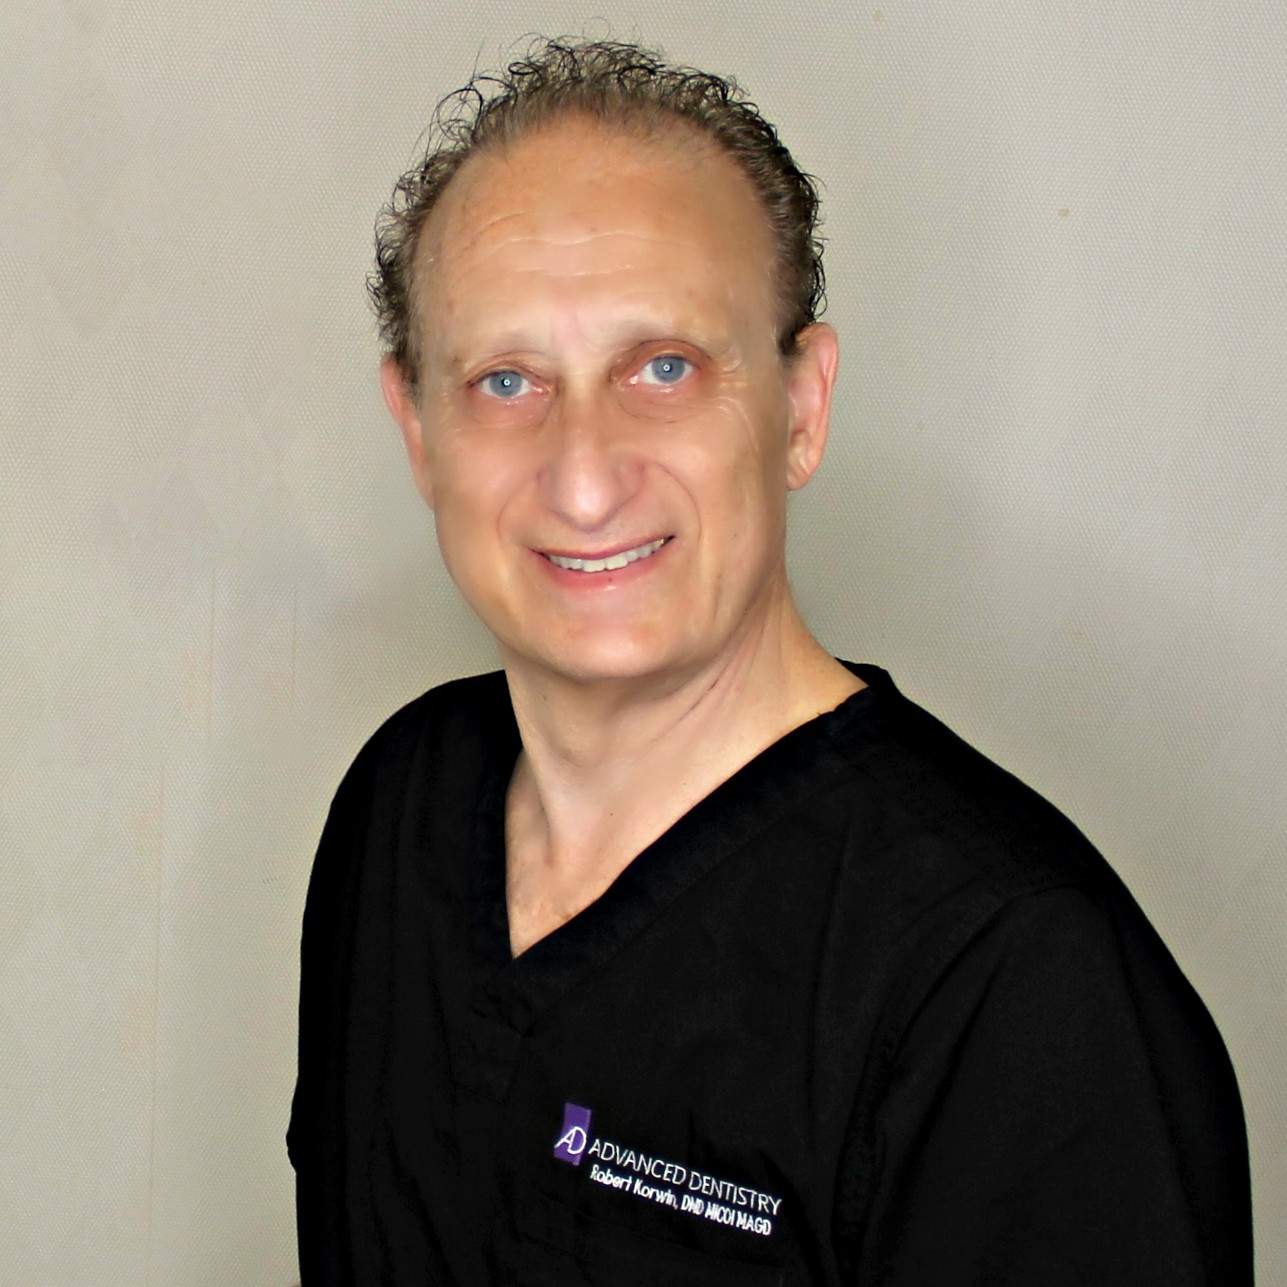 Dr. Robert Korwin